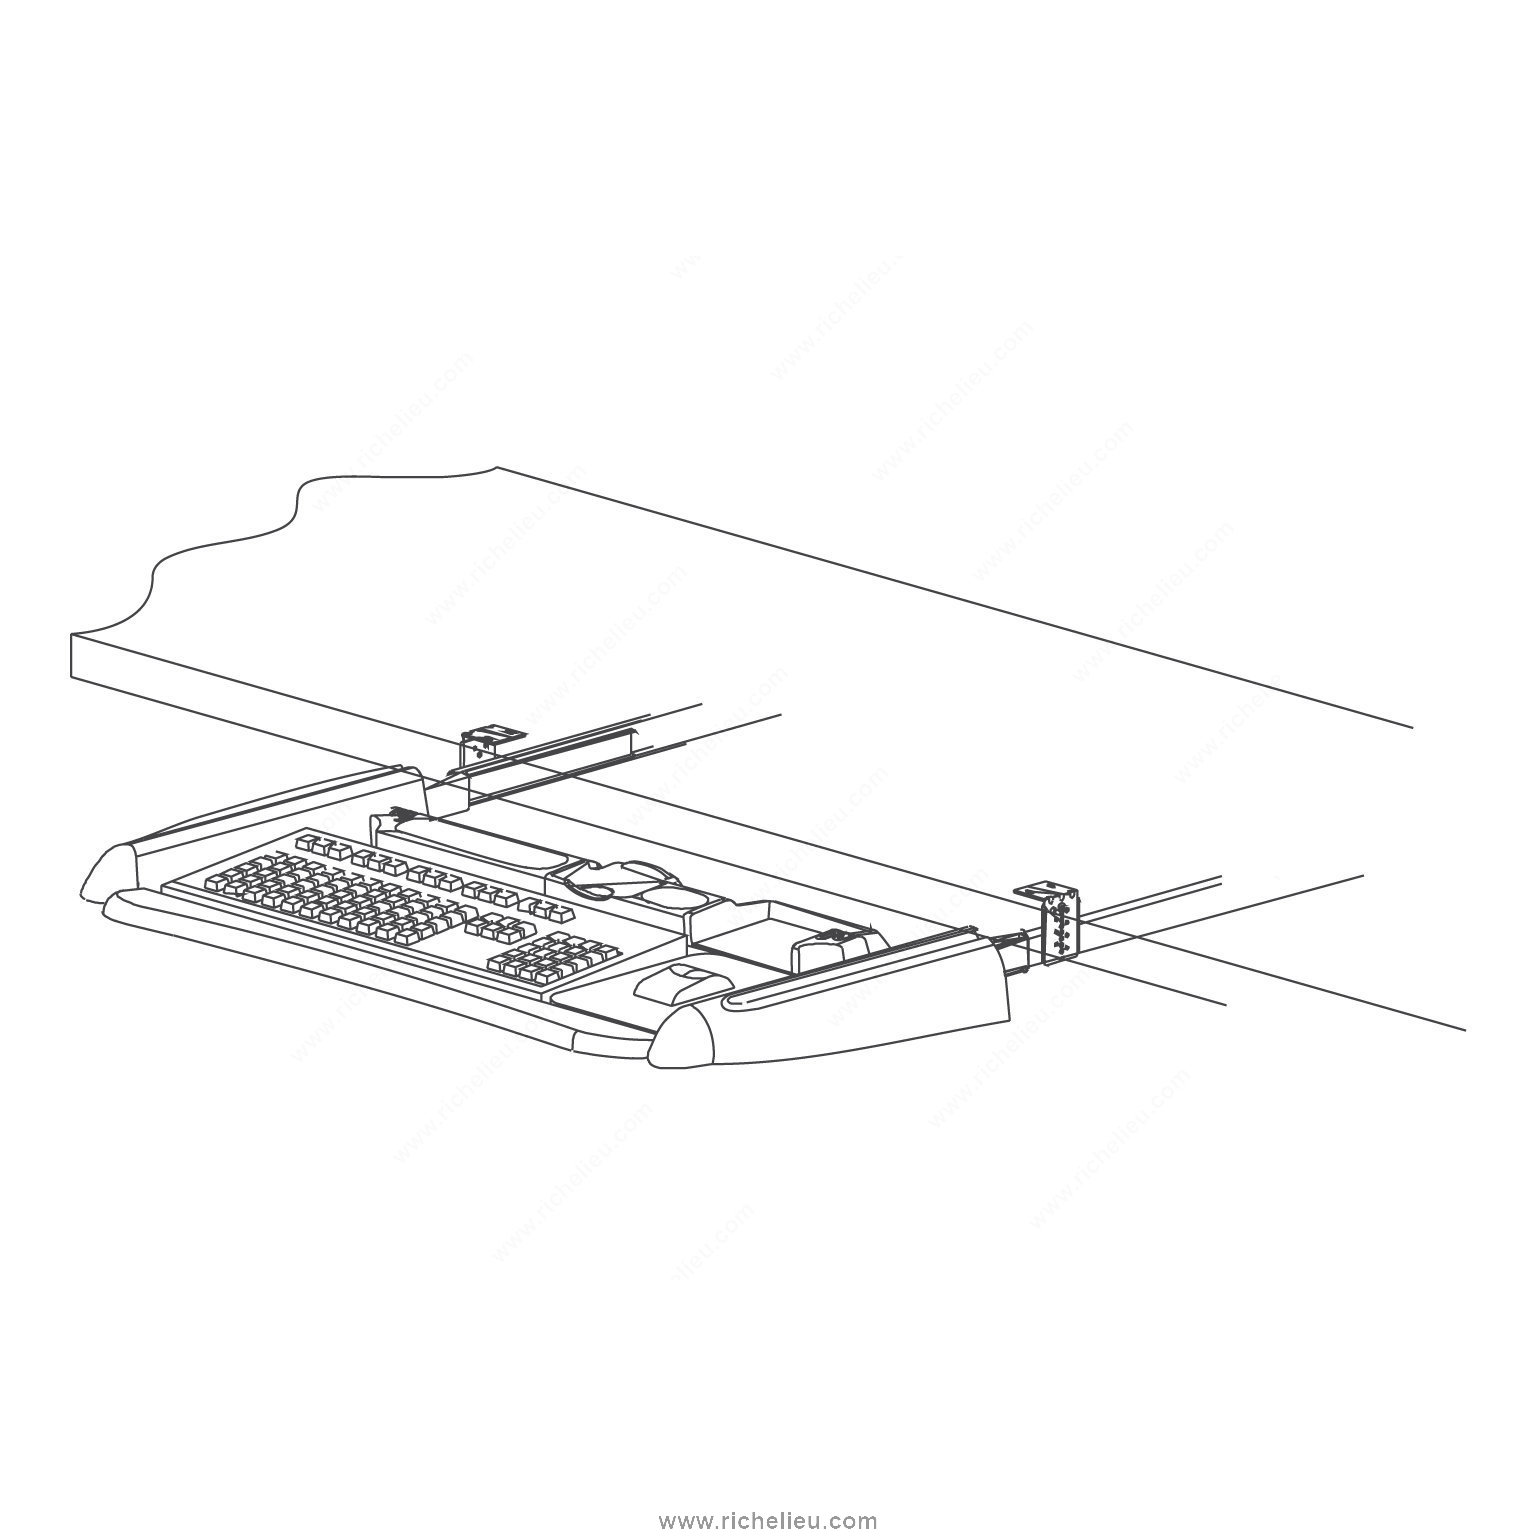 Drawer Slide Richelieu Drawer Slide Installation Instructions